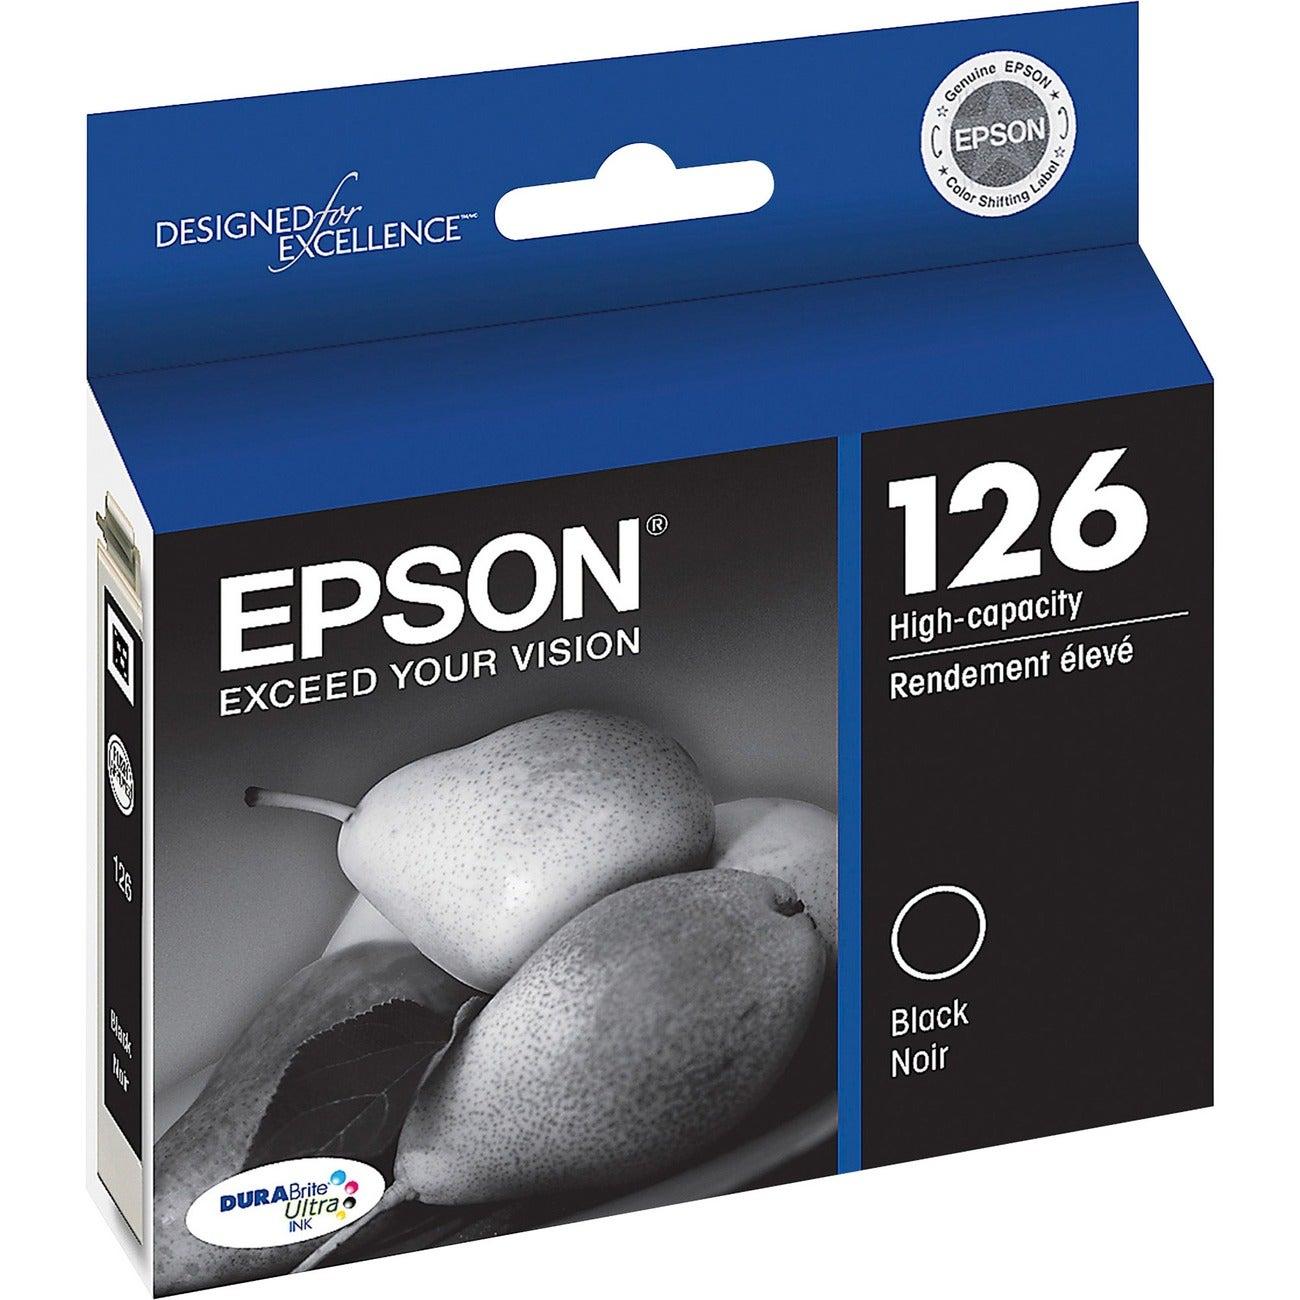 Epson DURABrite 126 High Capacity Ink Cartridge at Sears.com